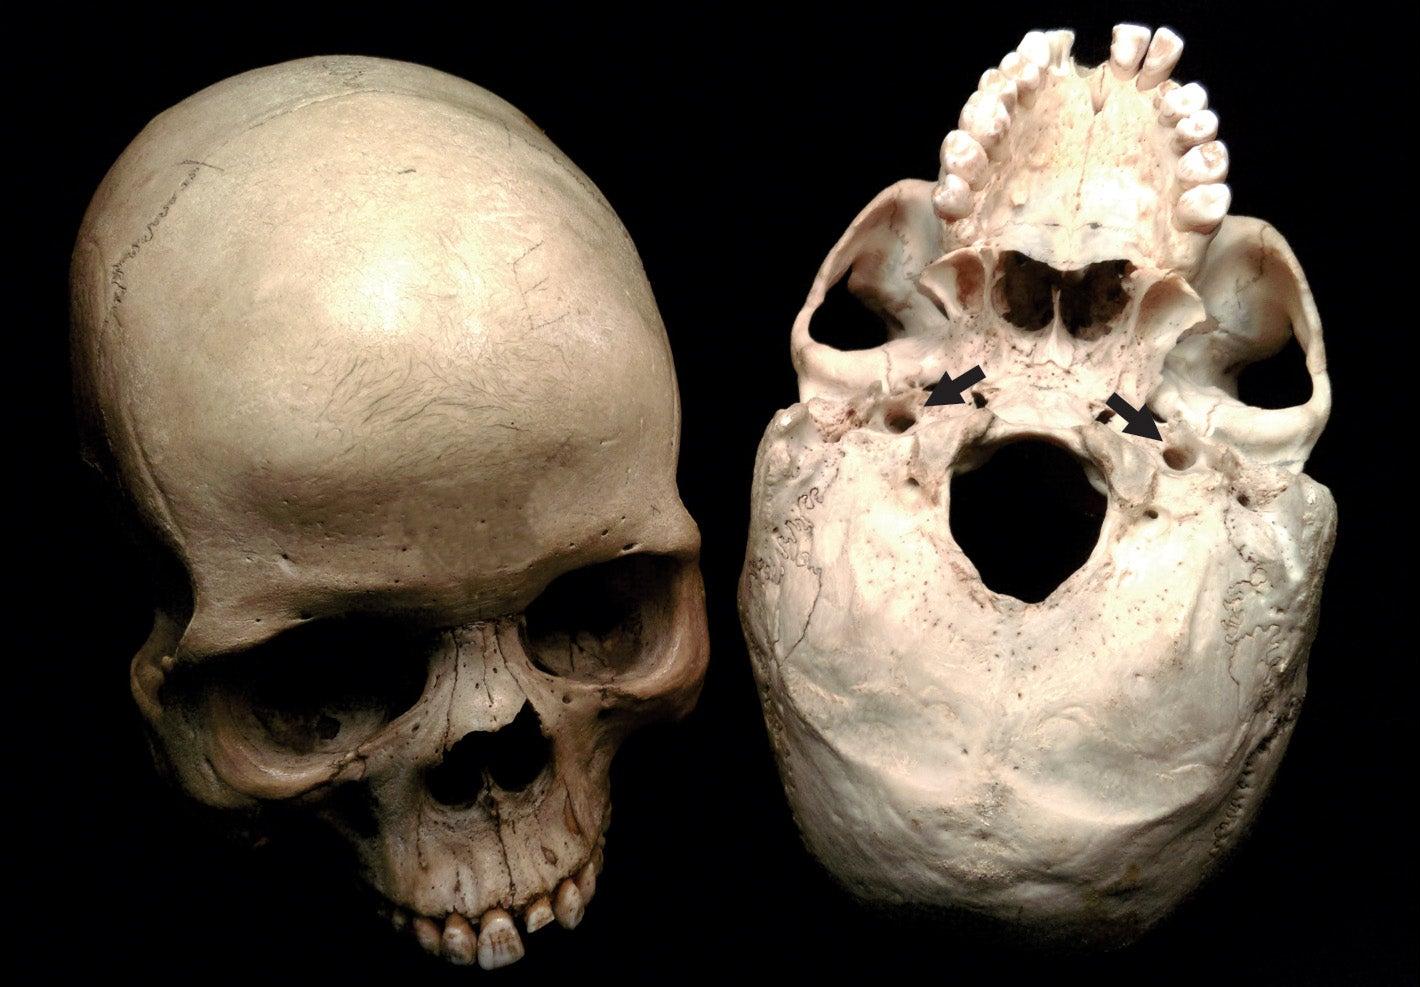 Blood-Guzzling Brain Key To Evolution Of Human Intelligence